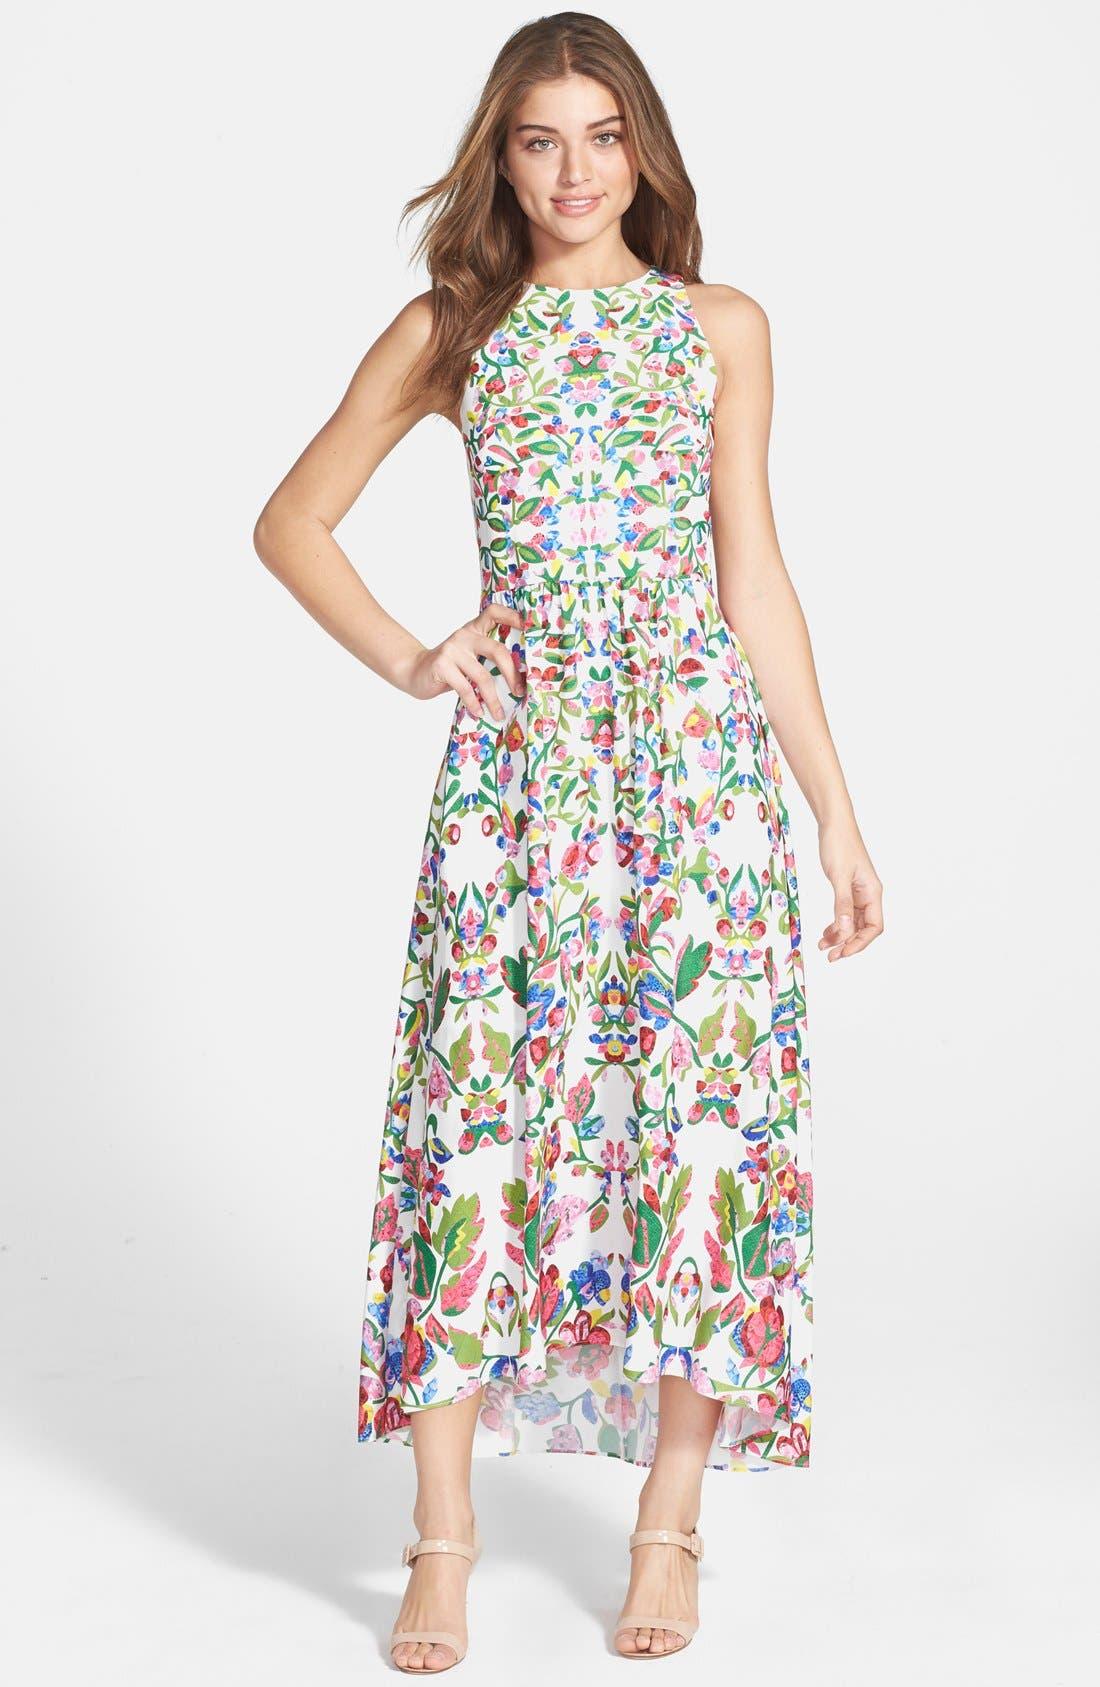 Alternate Image 1 Selected - Cynthia Steffe Print Fit & Flare Midi Dress